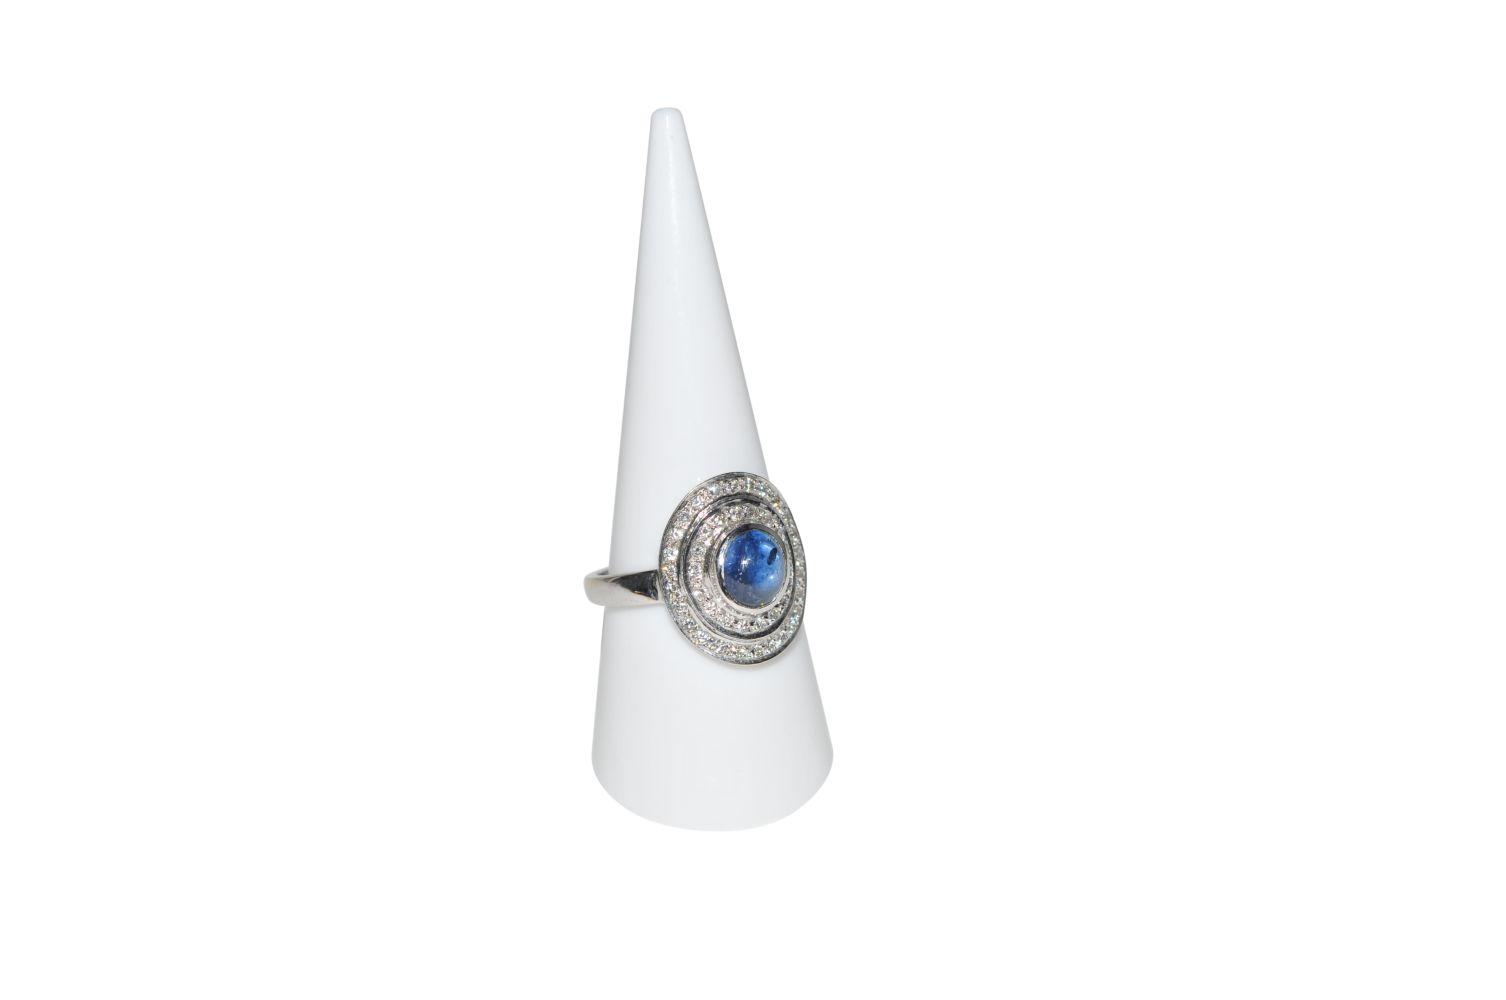 #99 Brilliant ring with sapphire | Brillantring mit Saphir Image